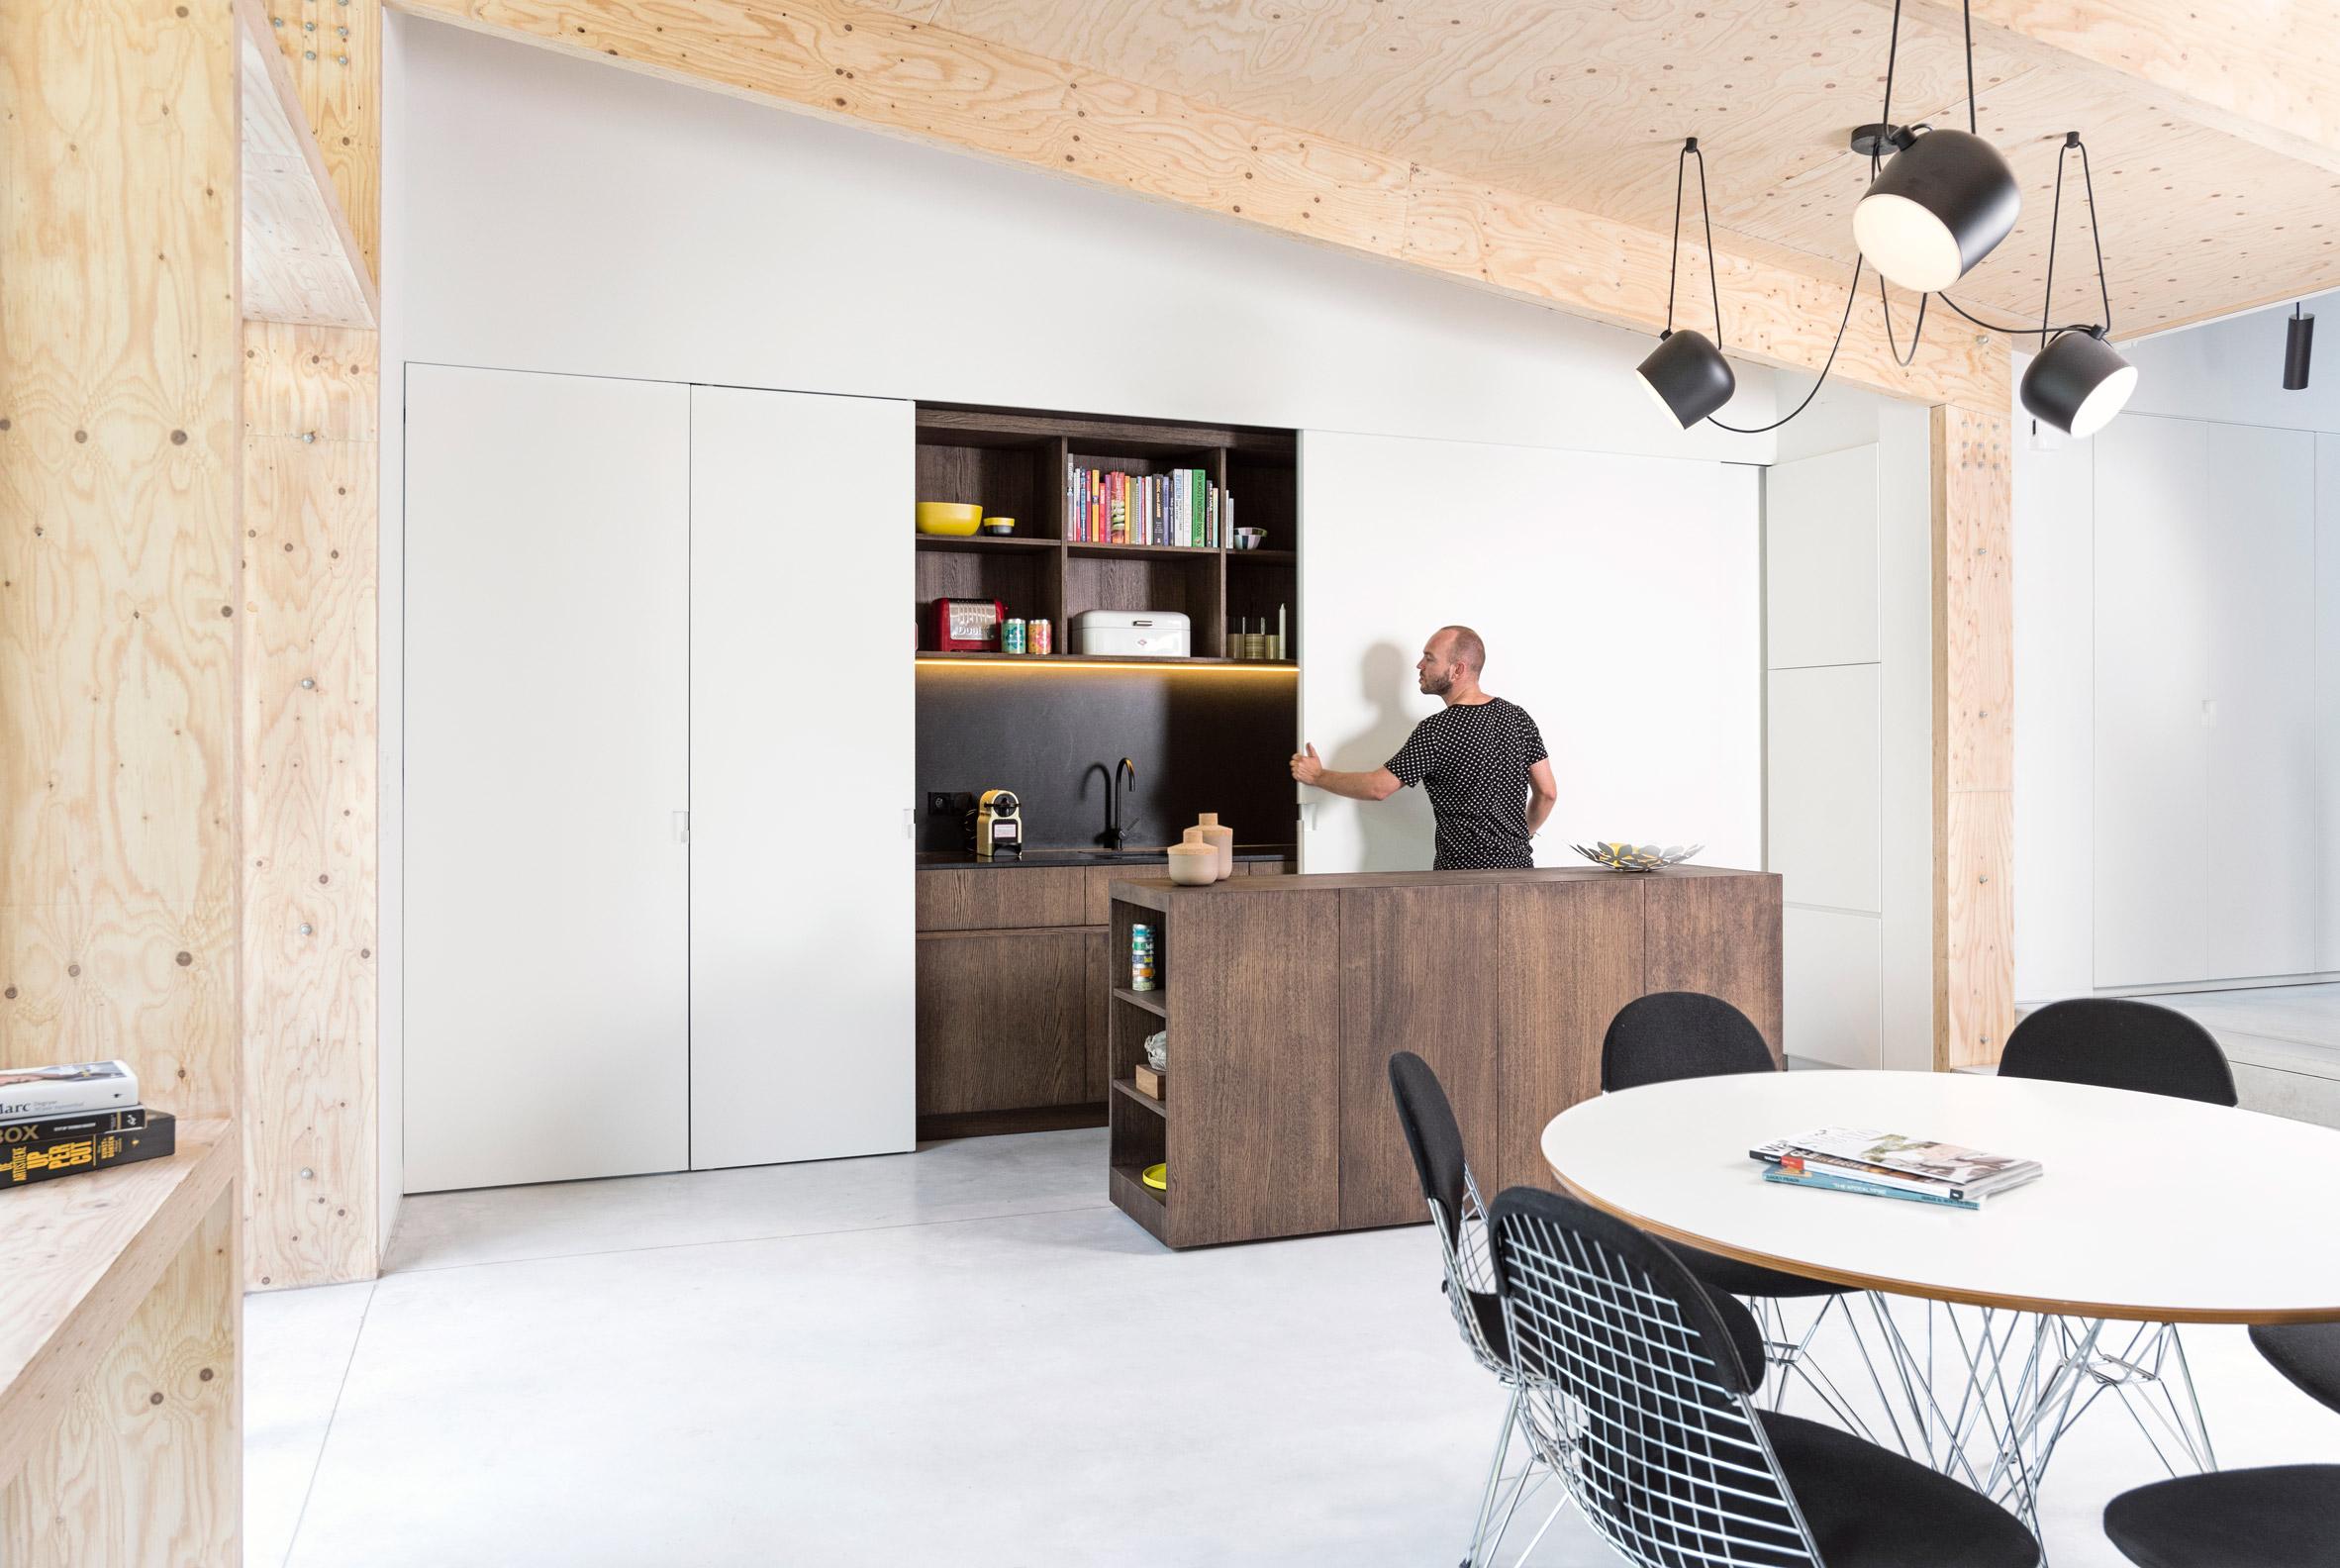 architecture-semi-detached-house-with-an-outdoor-areadesign-studia-interiors-osnovadesign-osnova-poltava_13